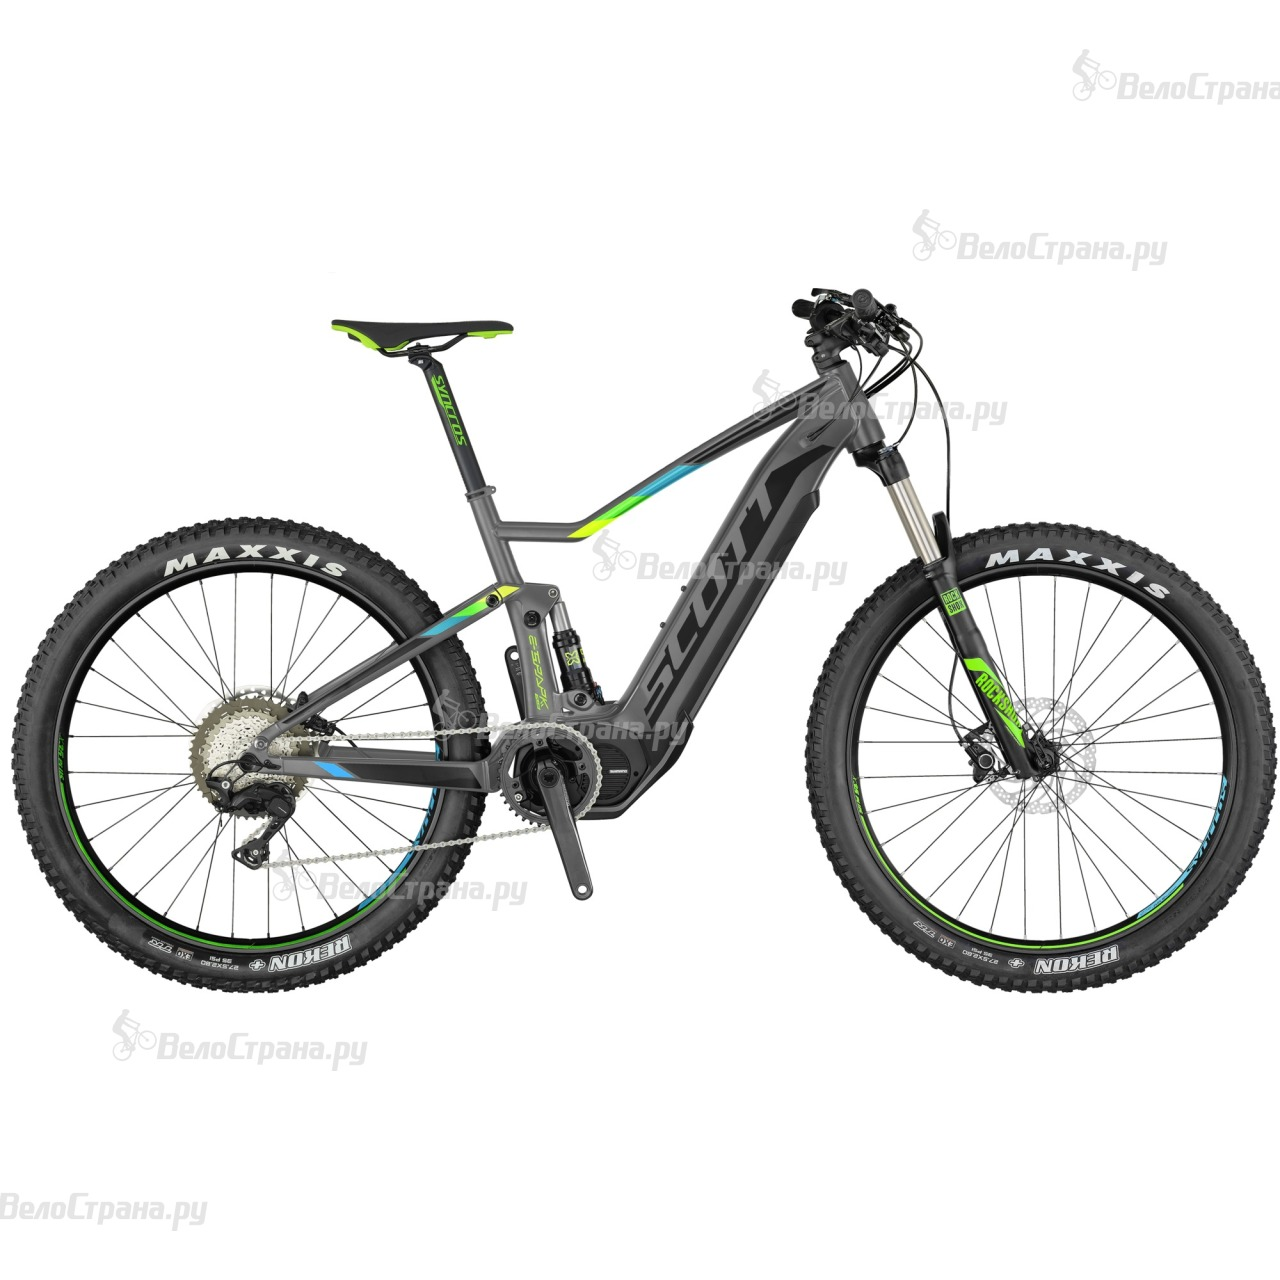 Велосипед Scott E-Spark 720 Plus (2017) велосипед scott spark 720 2015